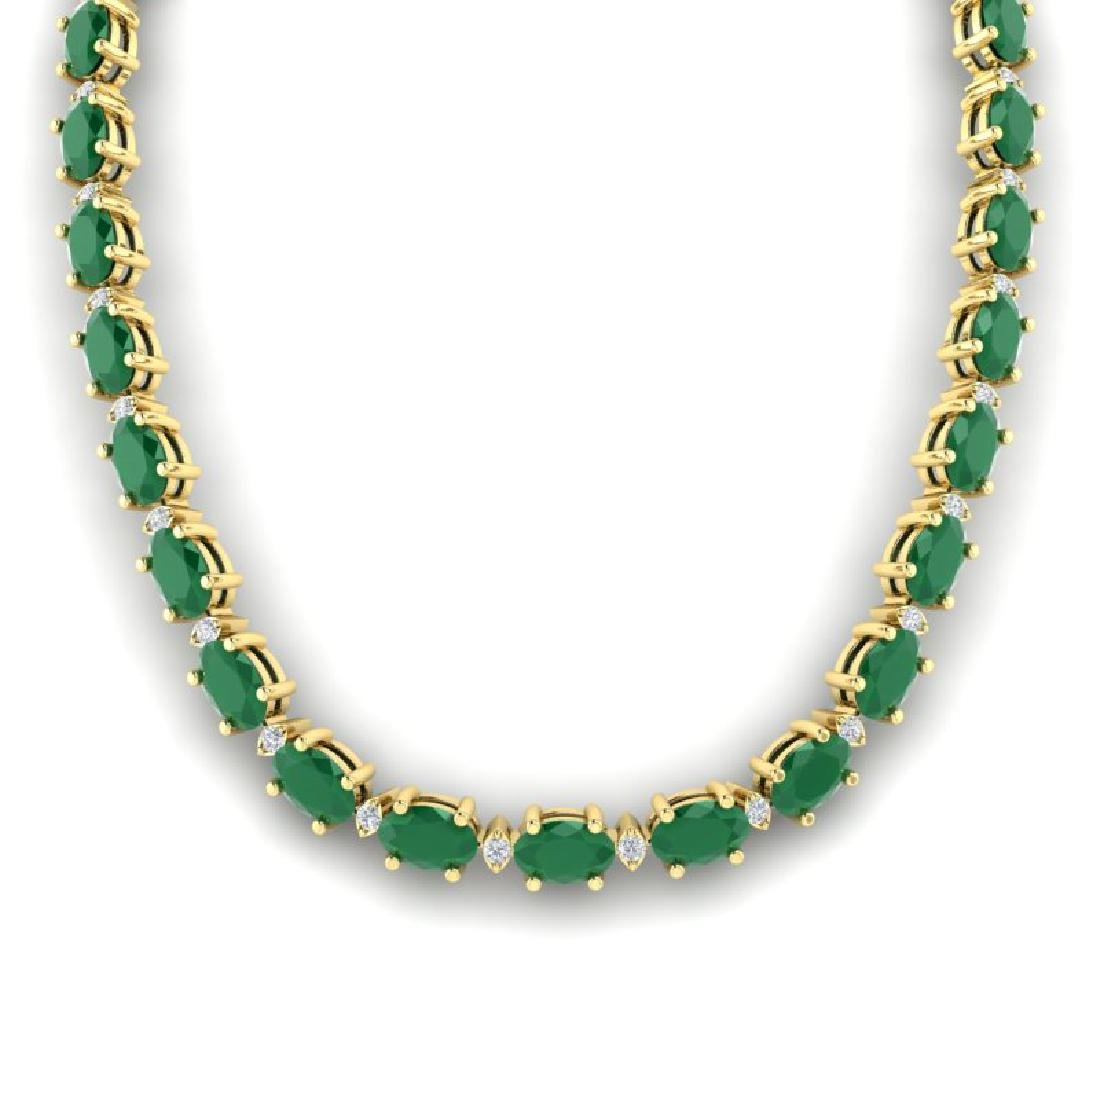 35 CTW Emerald & VS/SI Diamond Eternity Tennis Necklace - 3